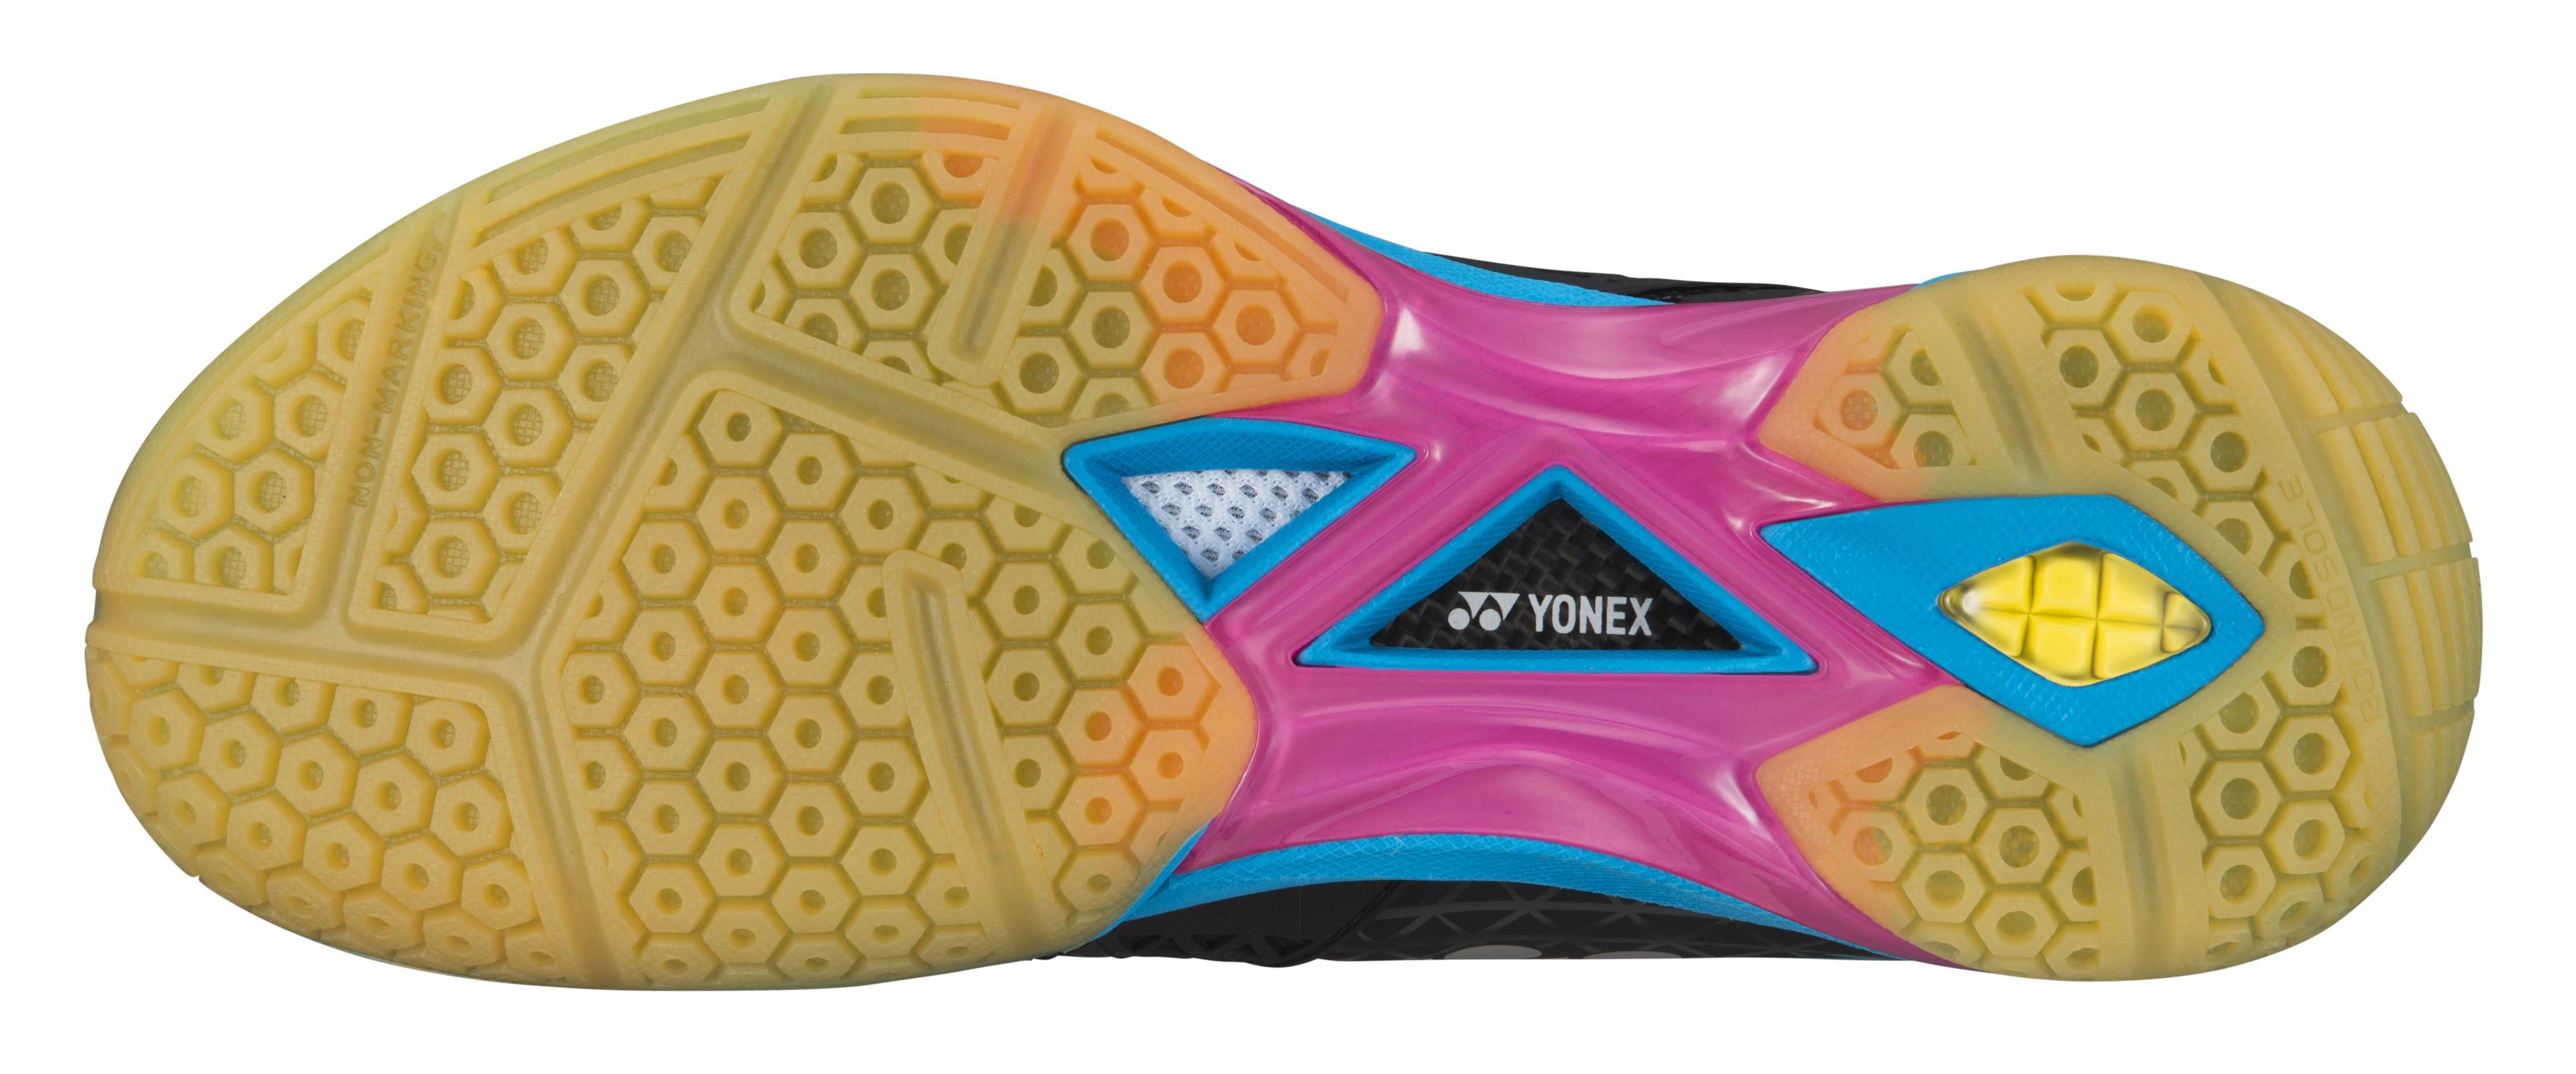 YONEX Power Cushion Eclipsion Z Z Z damen Badmintonschuh Squash Tischtennis 39f431